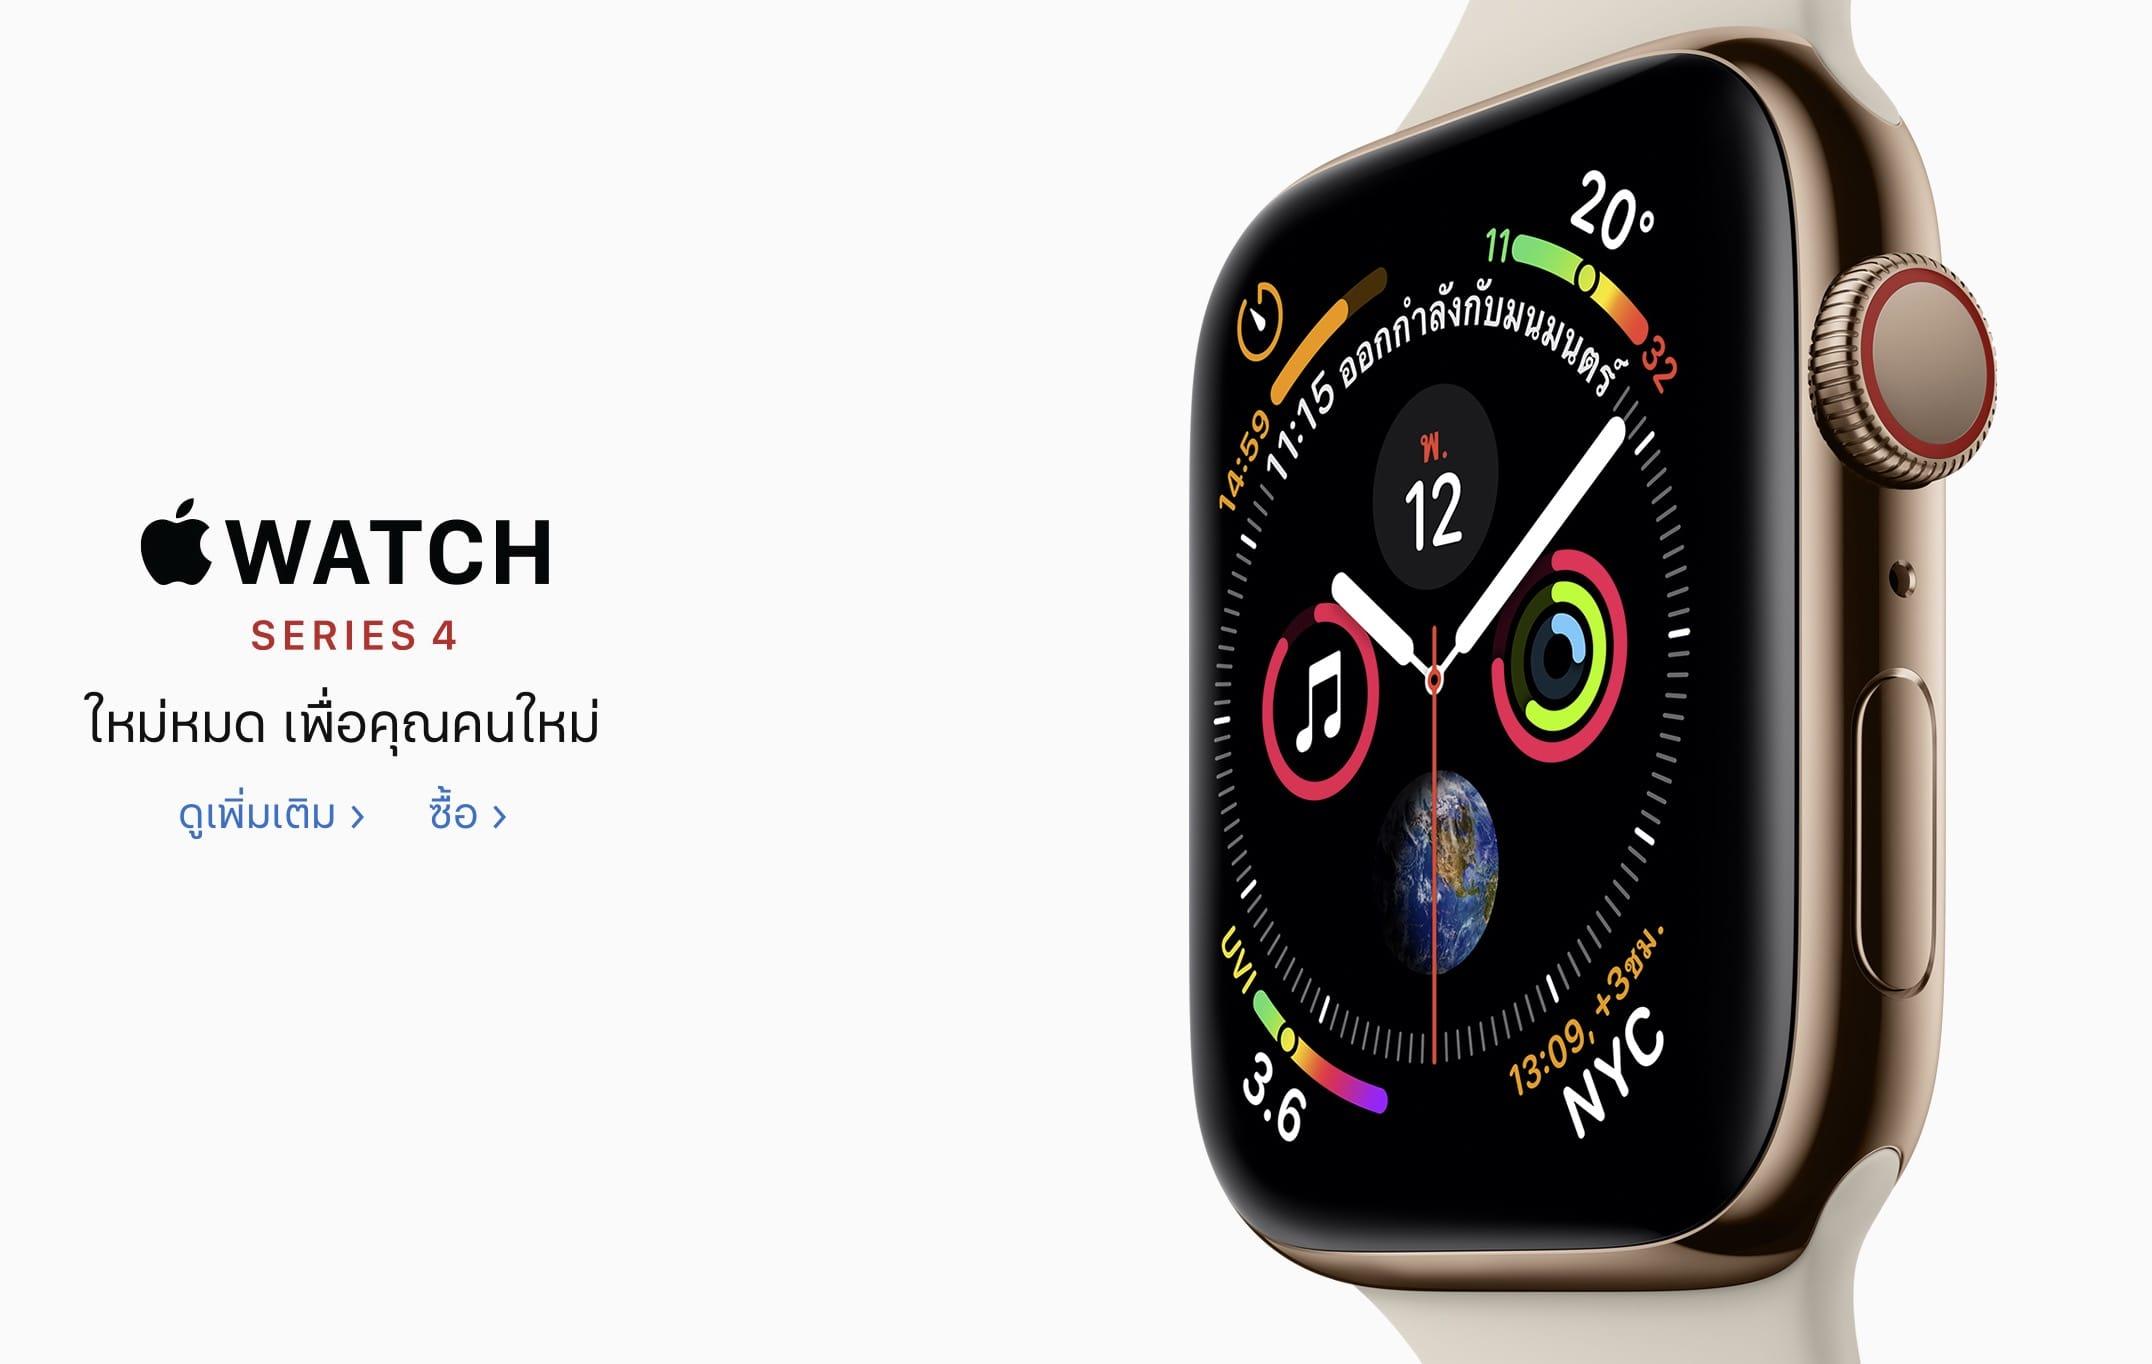 Apple Watch Series 4 Apple Store Thailand